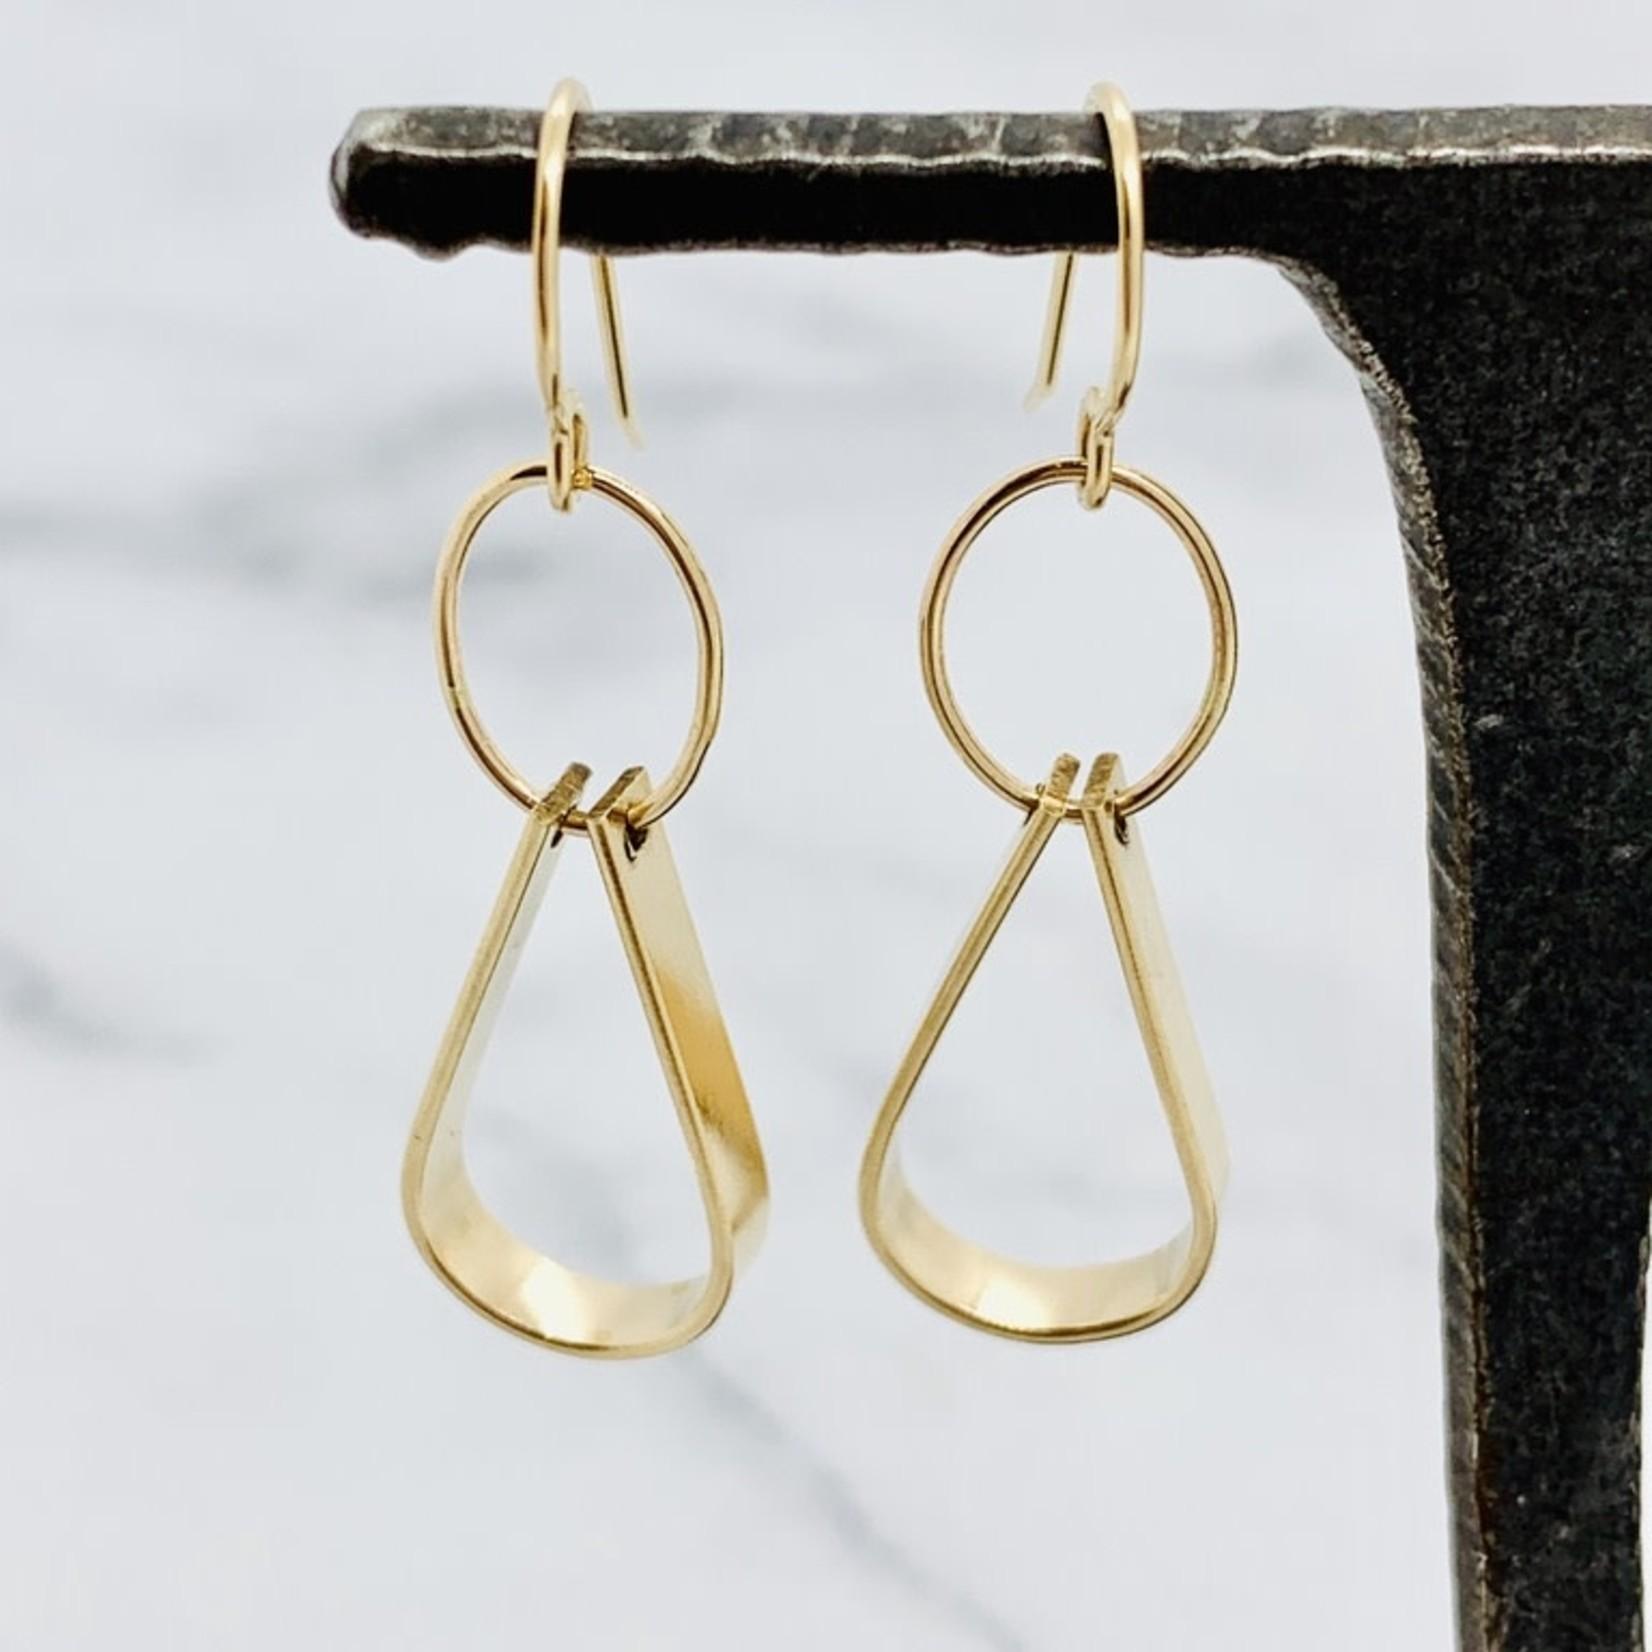 Handmade 14kt Gold Filled Double Drop Earring